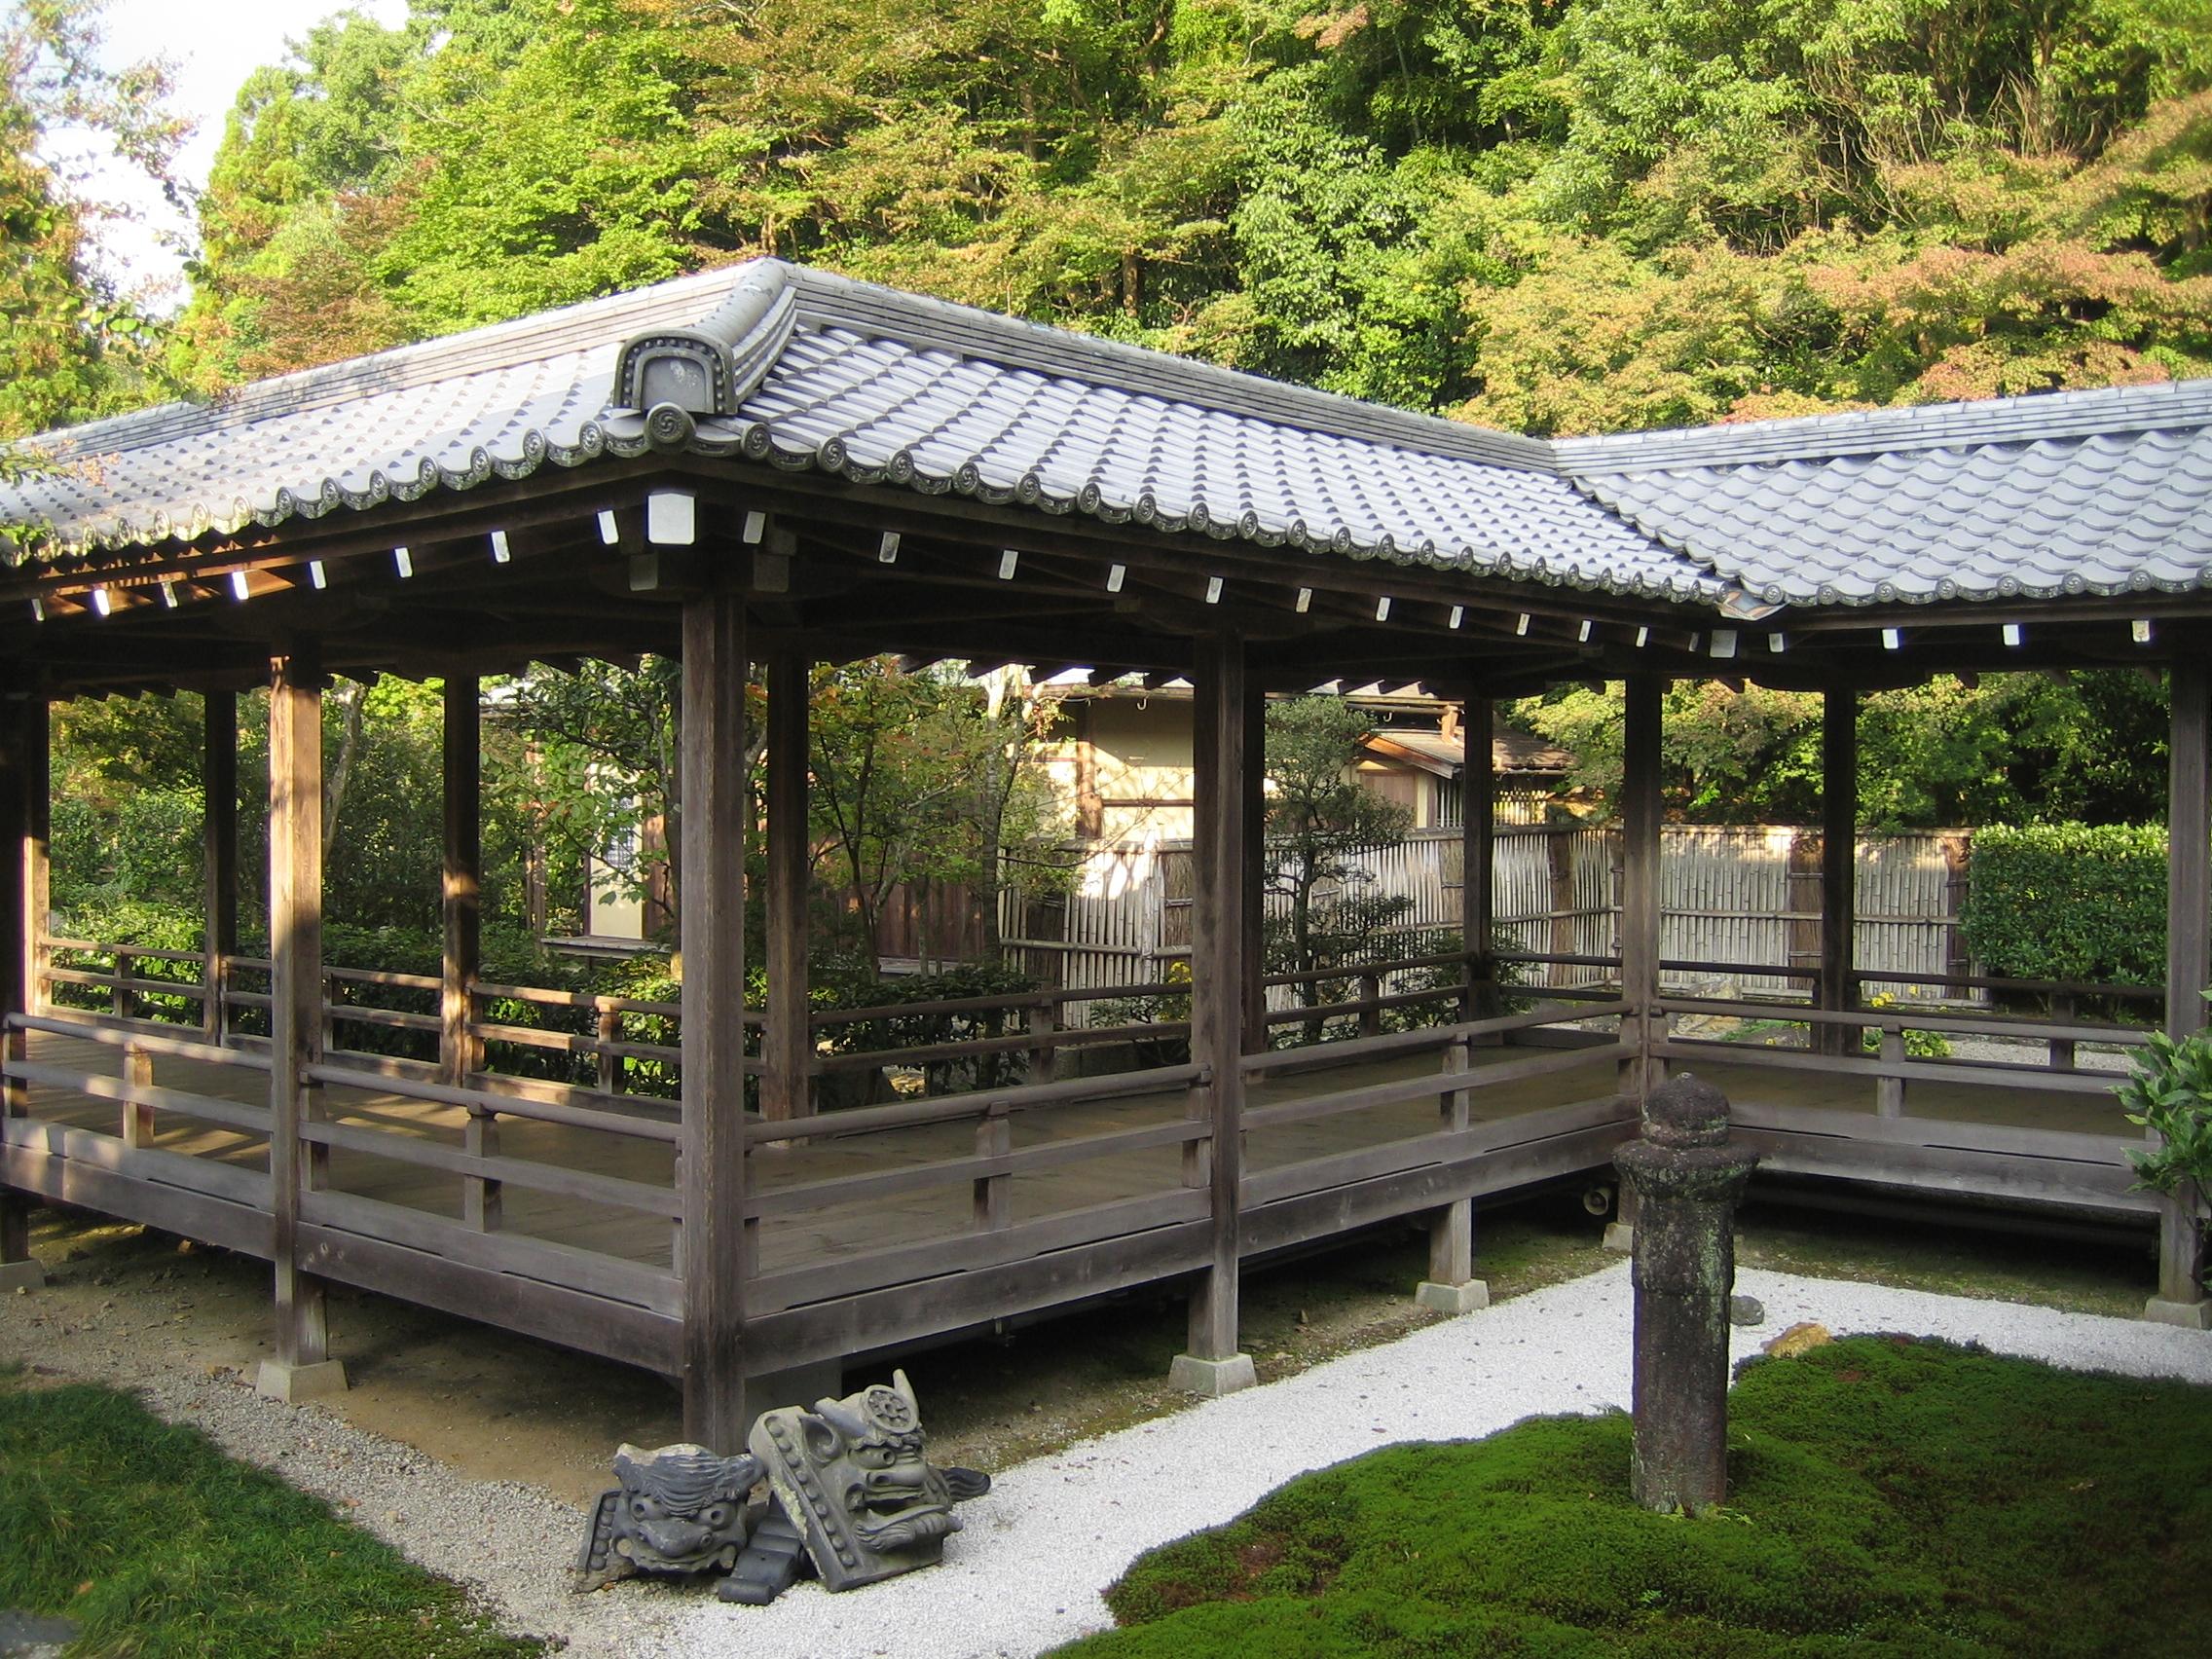 Kyoto 10-27-2005 3-35-37 PM.jpg